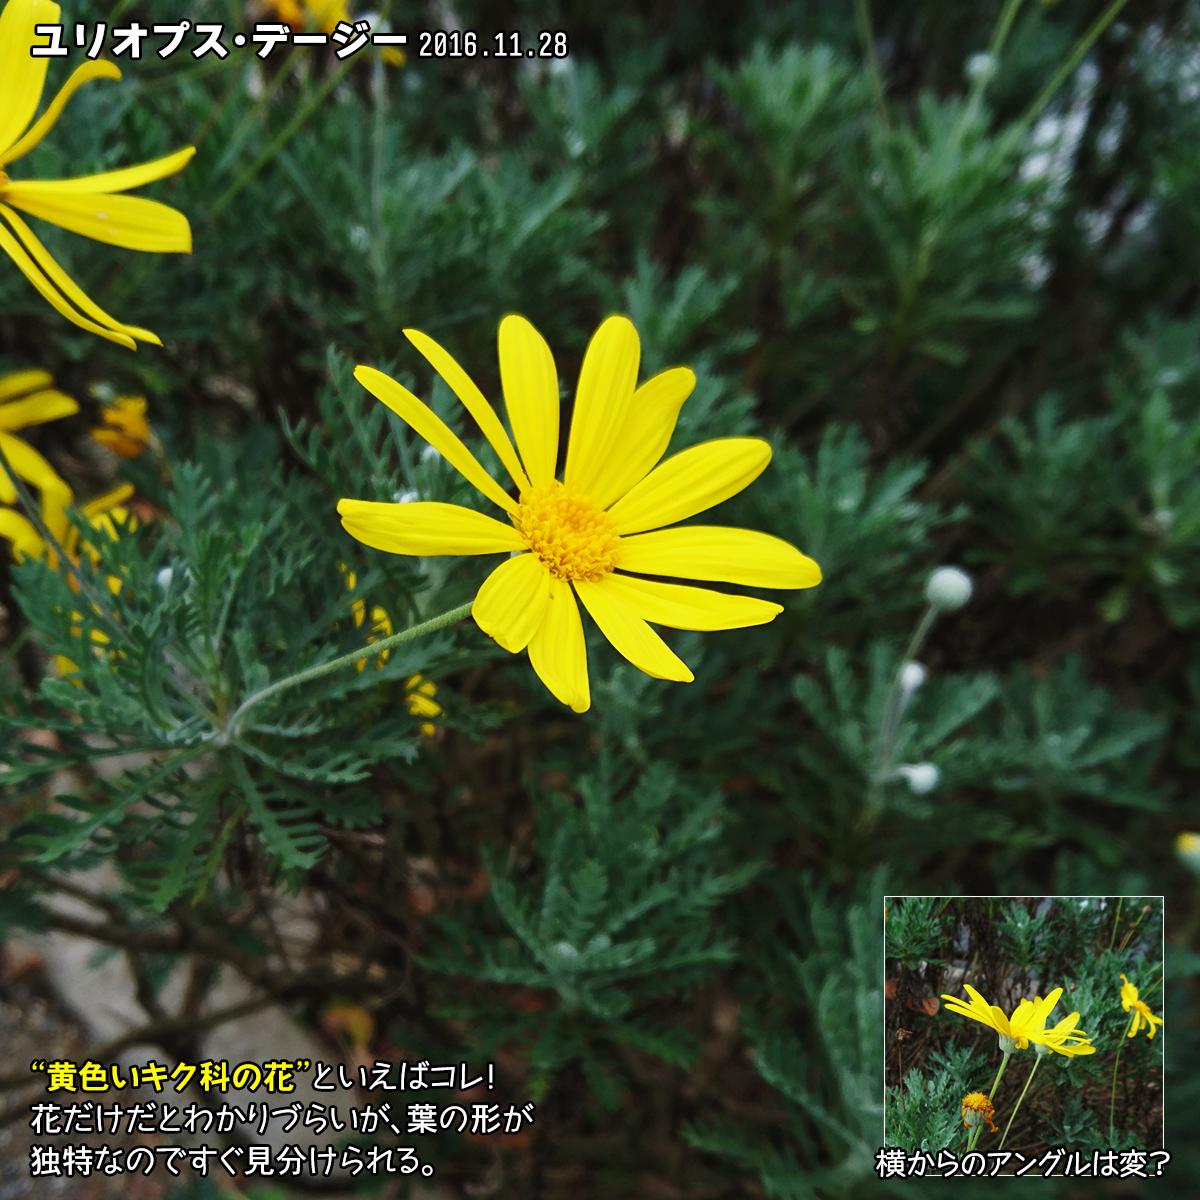 DSC_0605_1.jpg